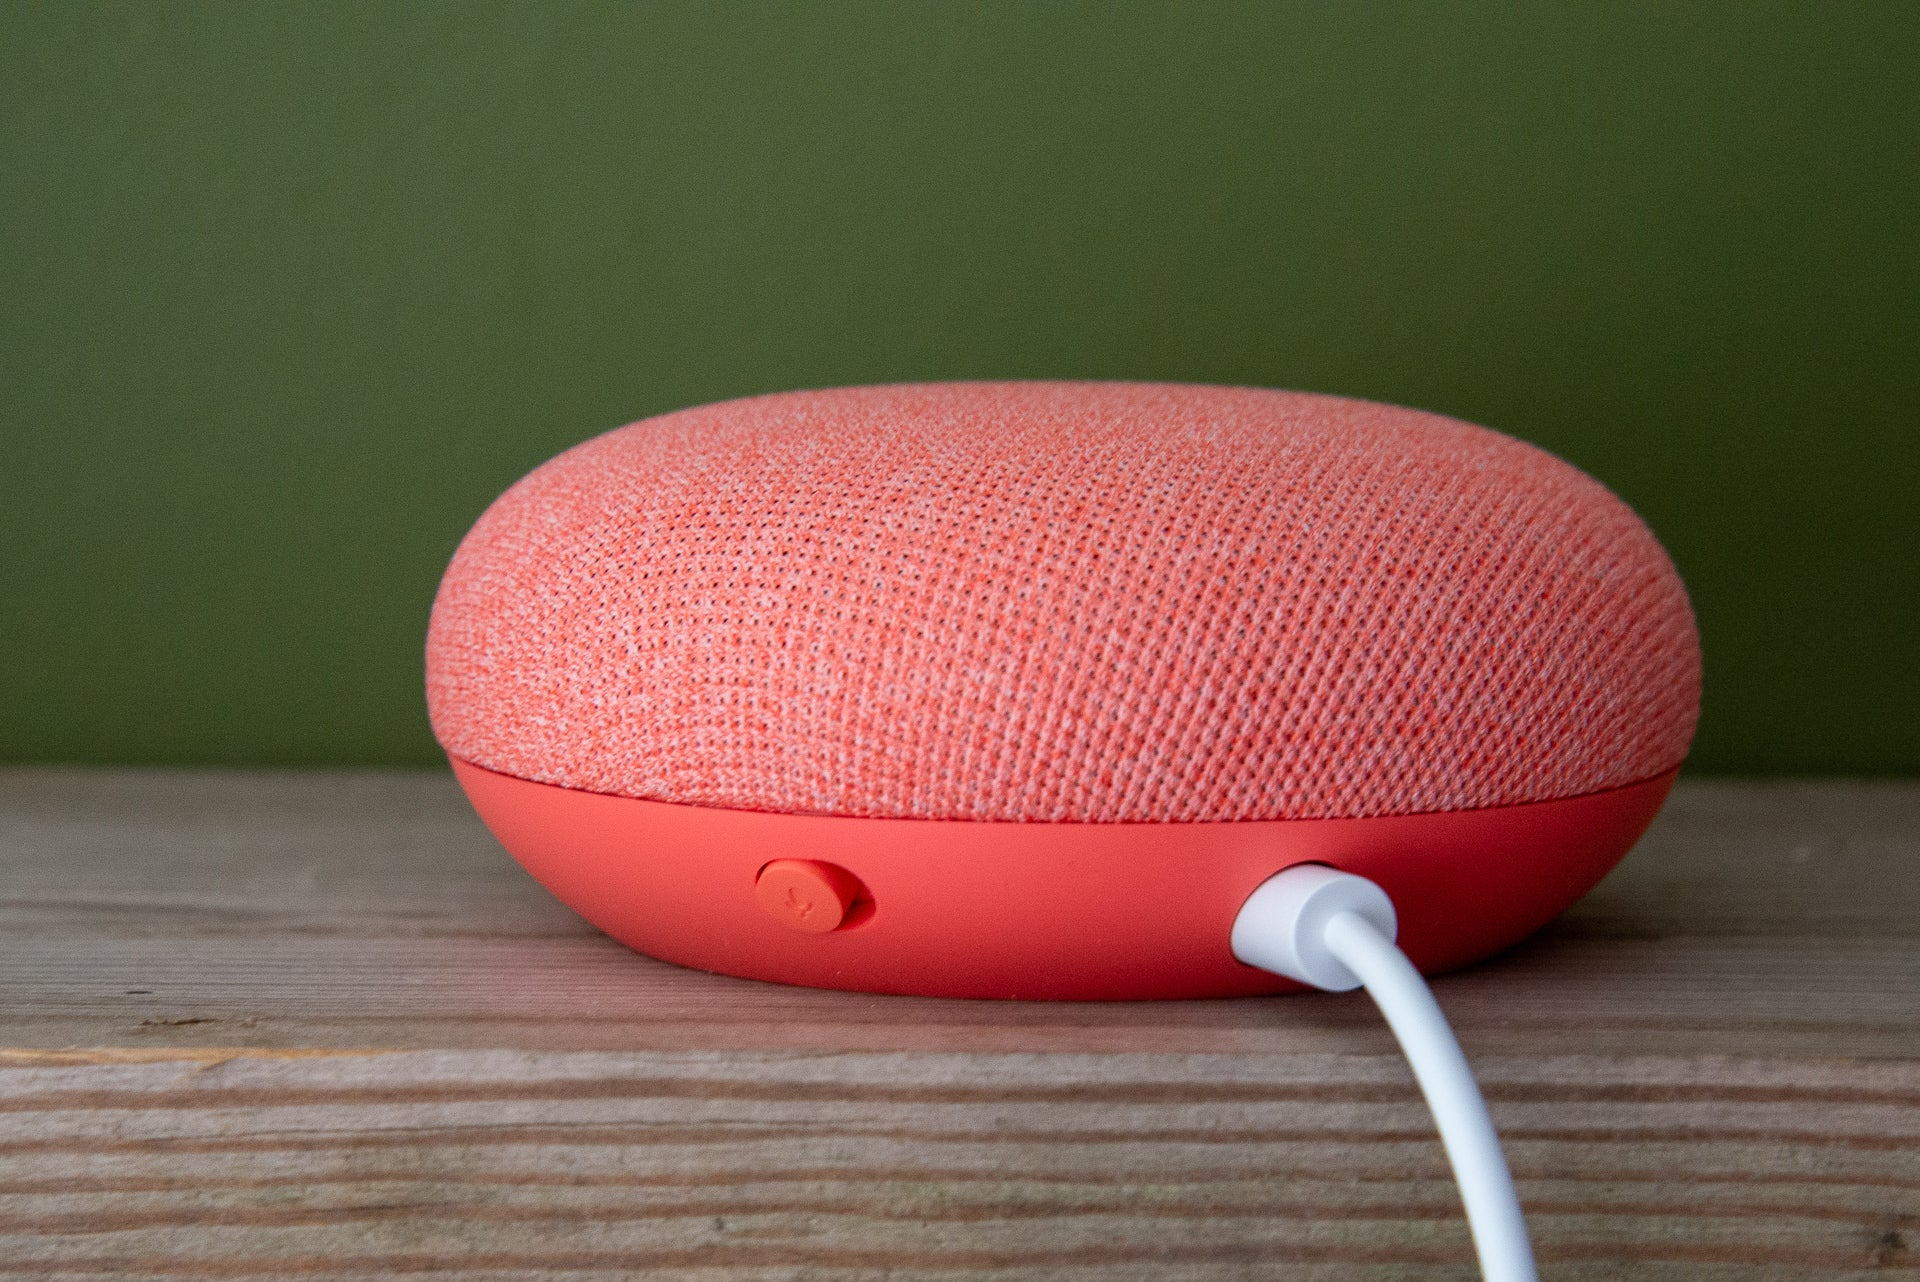 Google Nest Mini rear and mute switch